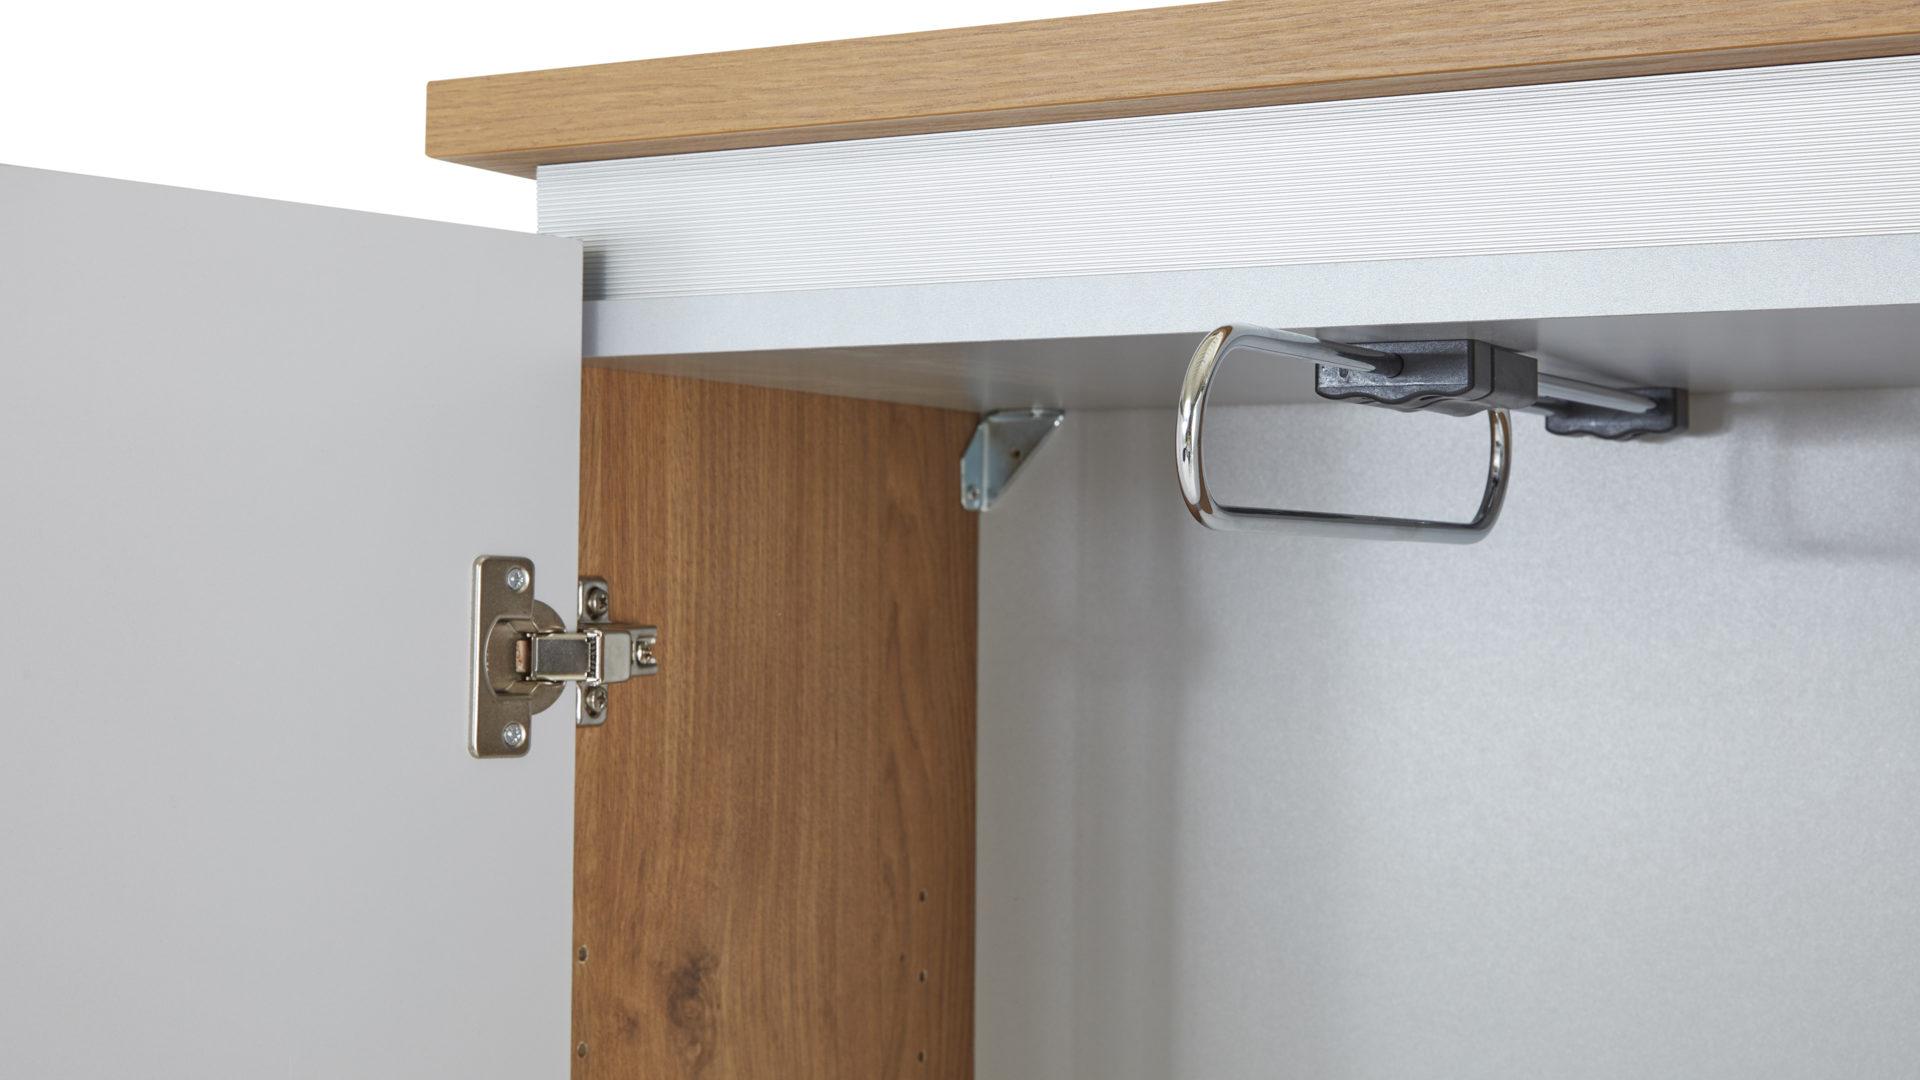 Möbel Hermes | Räume | Flur + Diele | Schränke + Schuhschränke ...